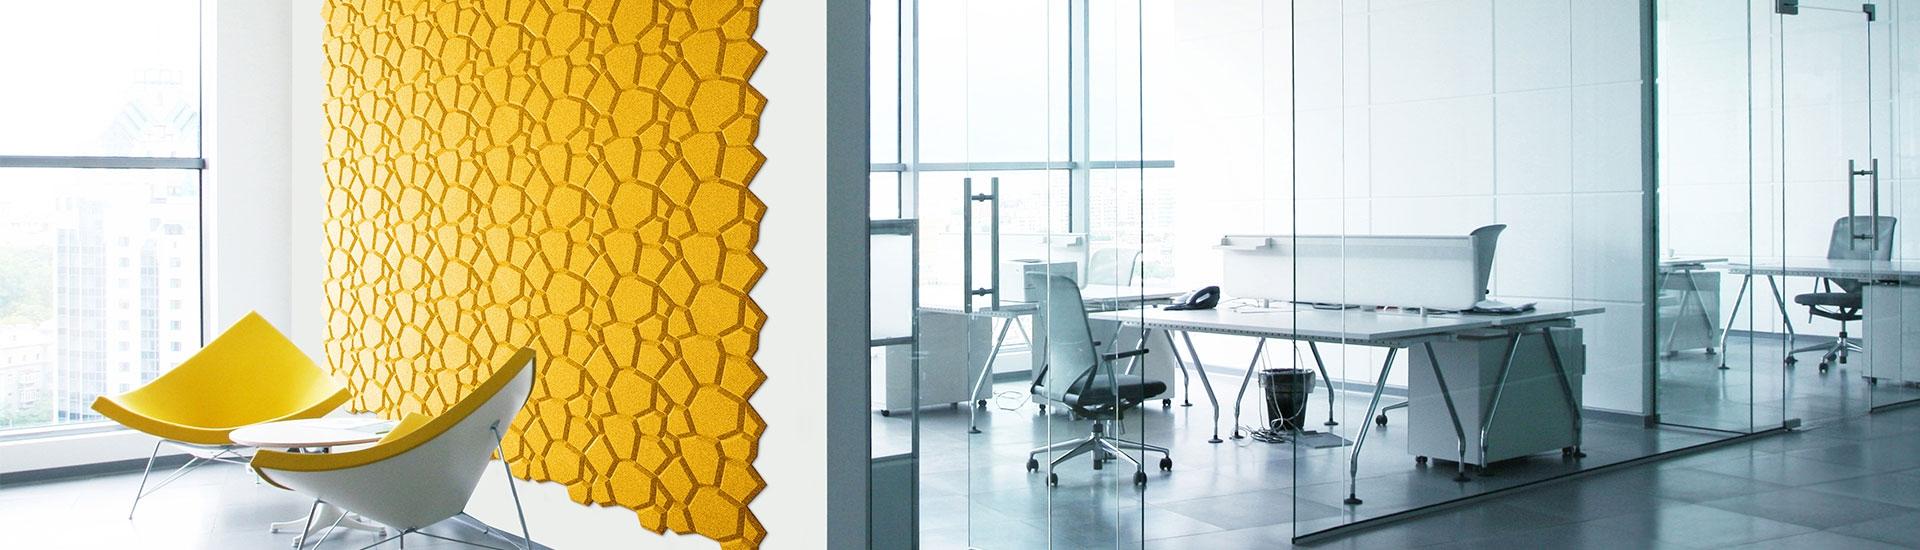 beehive_yellow